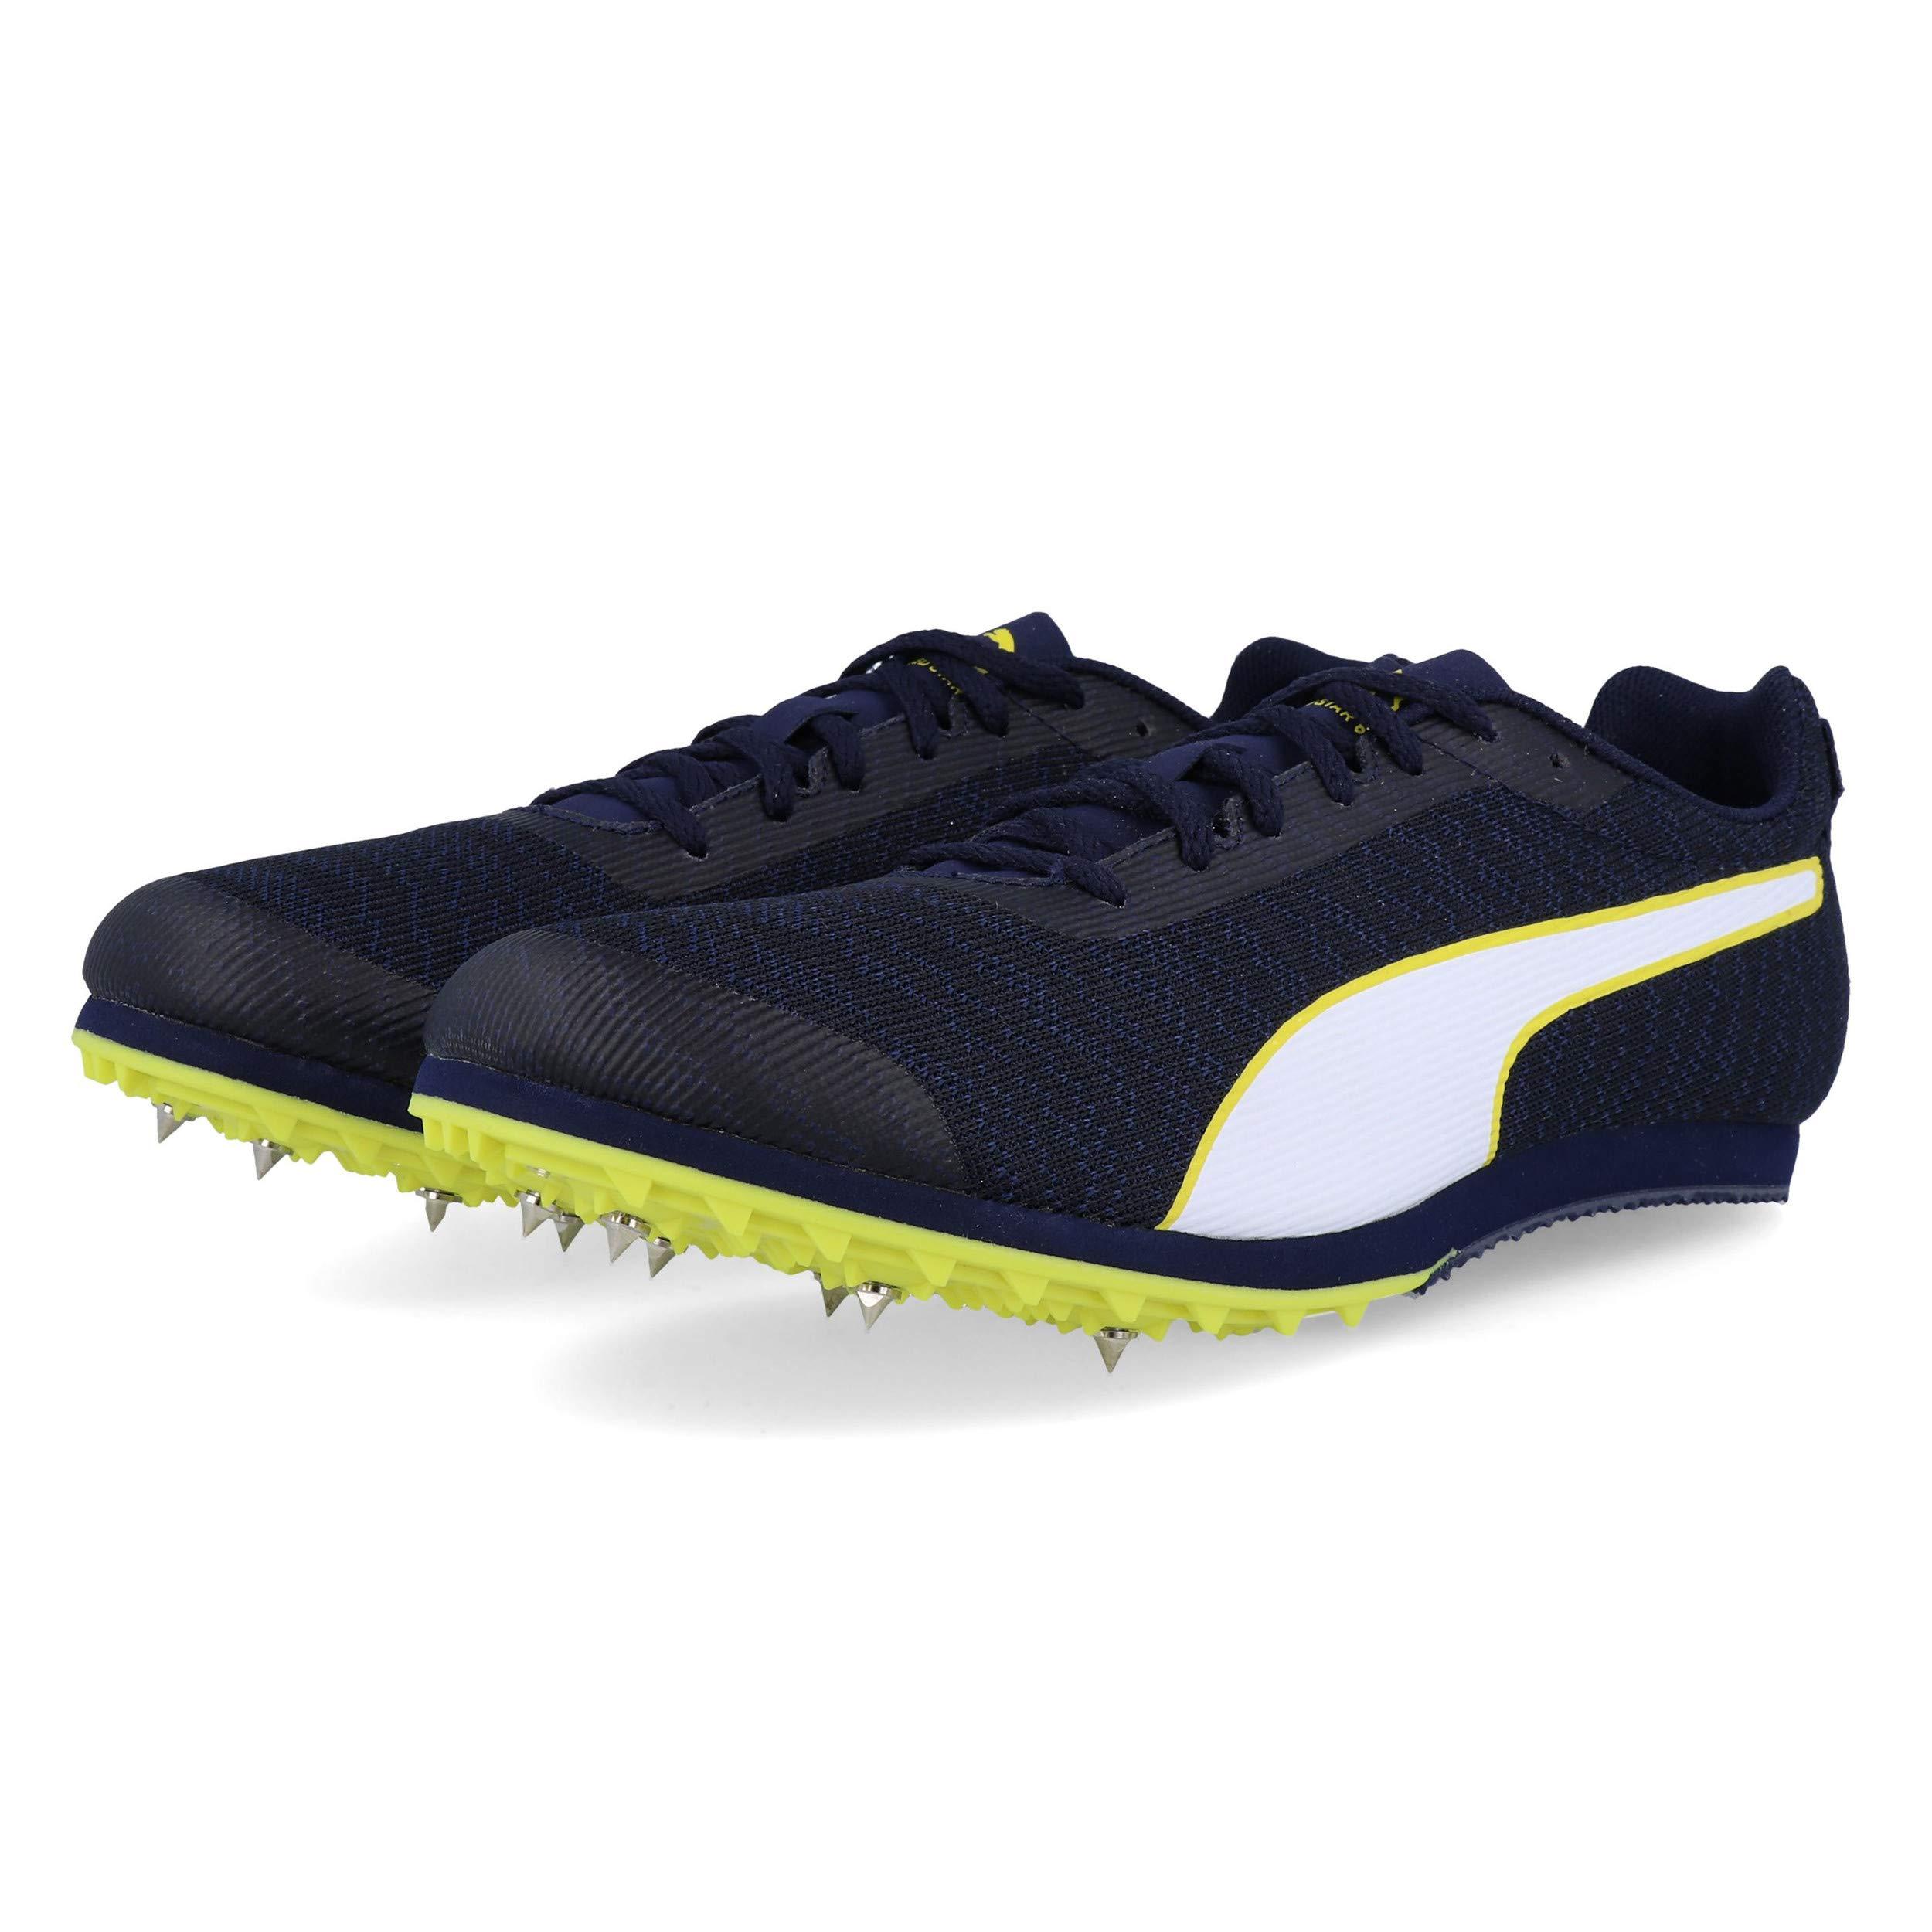 Puma Unisex Kids' Evospeed Star 6 Junior Track & Field Shoes